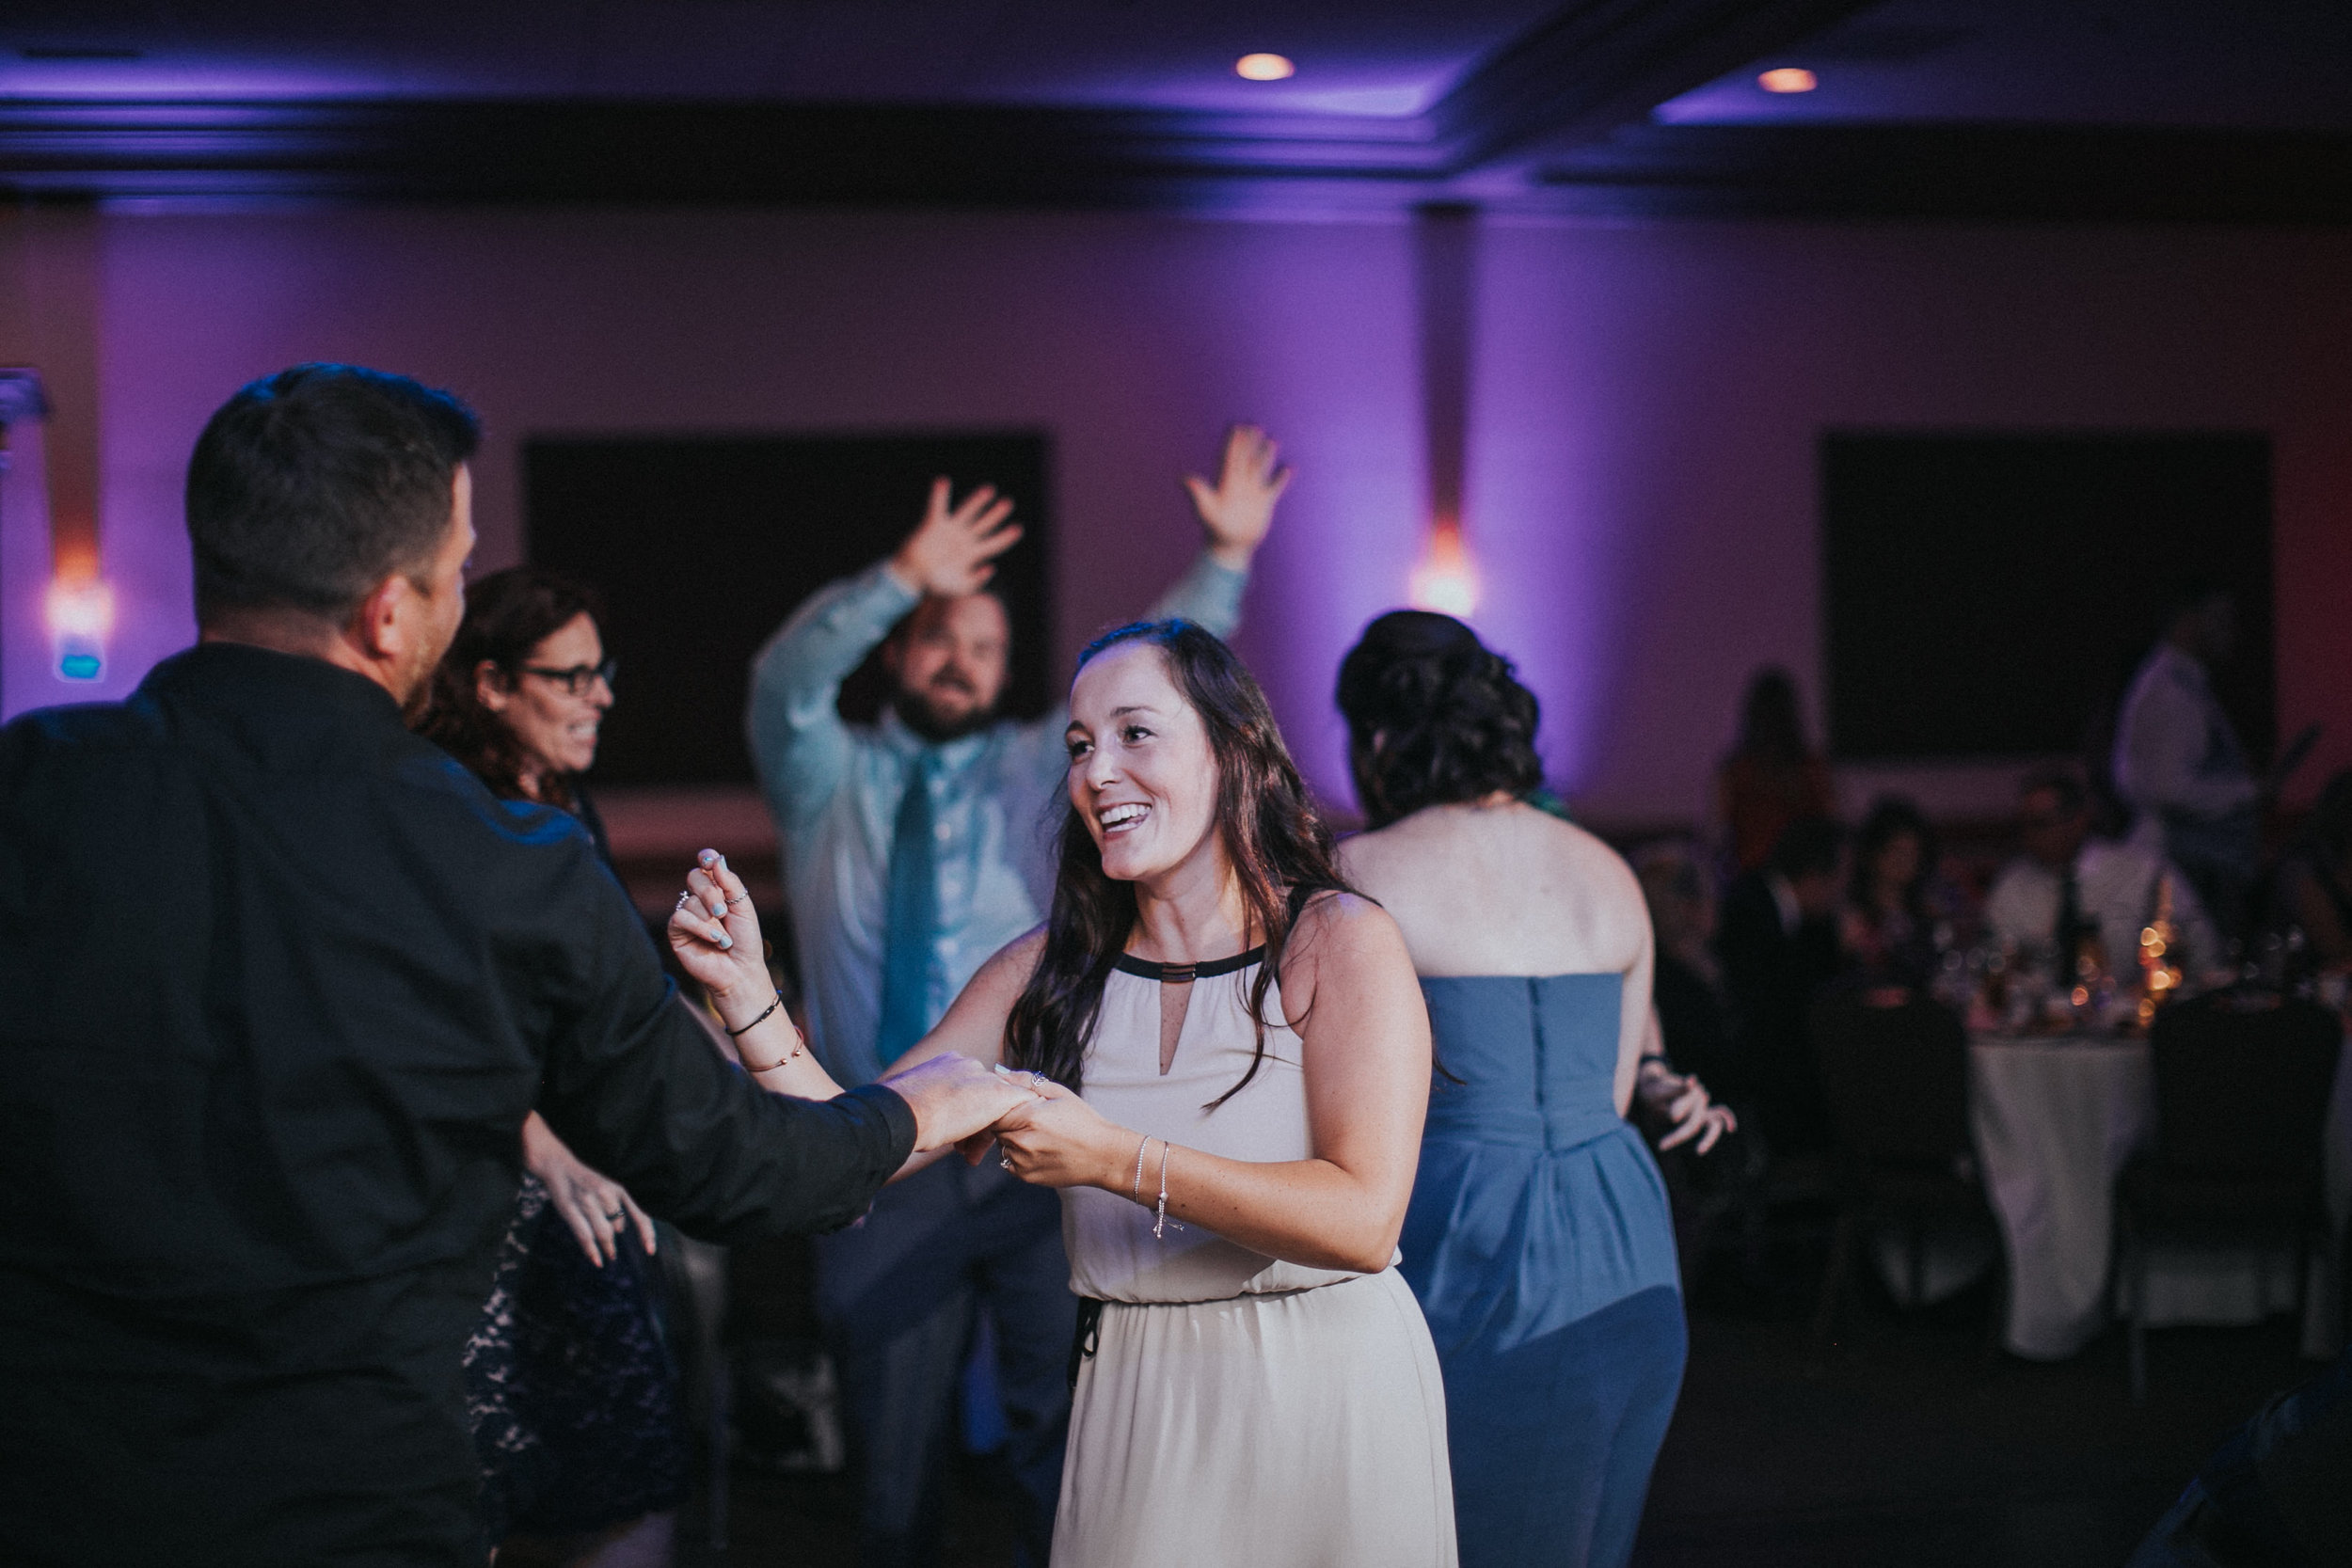 New-Jersey-Wedding-Photographer-JennaLynnPhotography-ValenzanoWinery-Reception-198.jpg